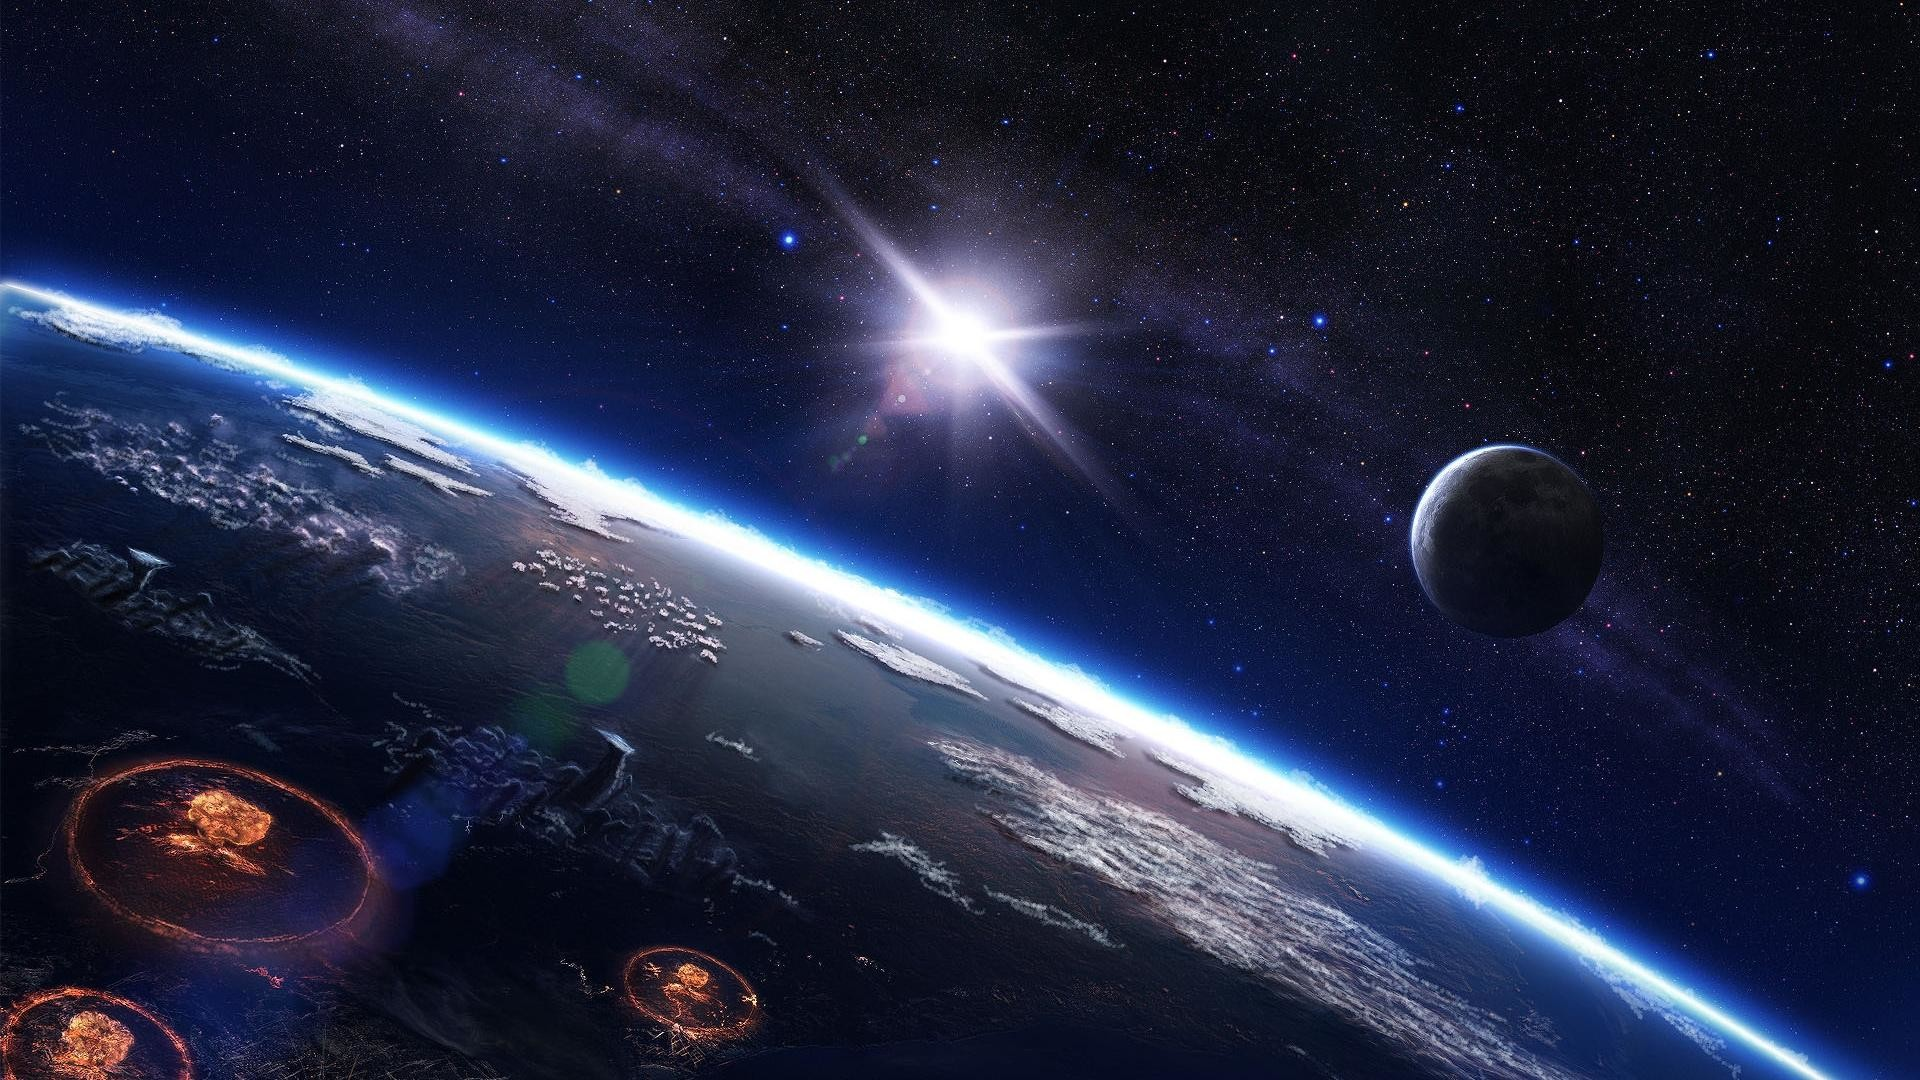 1920x1200 Mars Attacks Sci Fi Alien